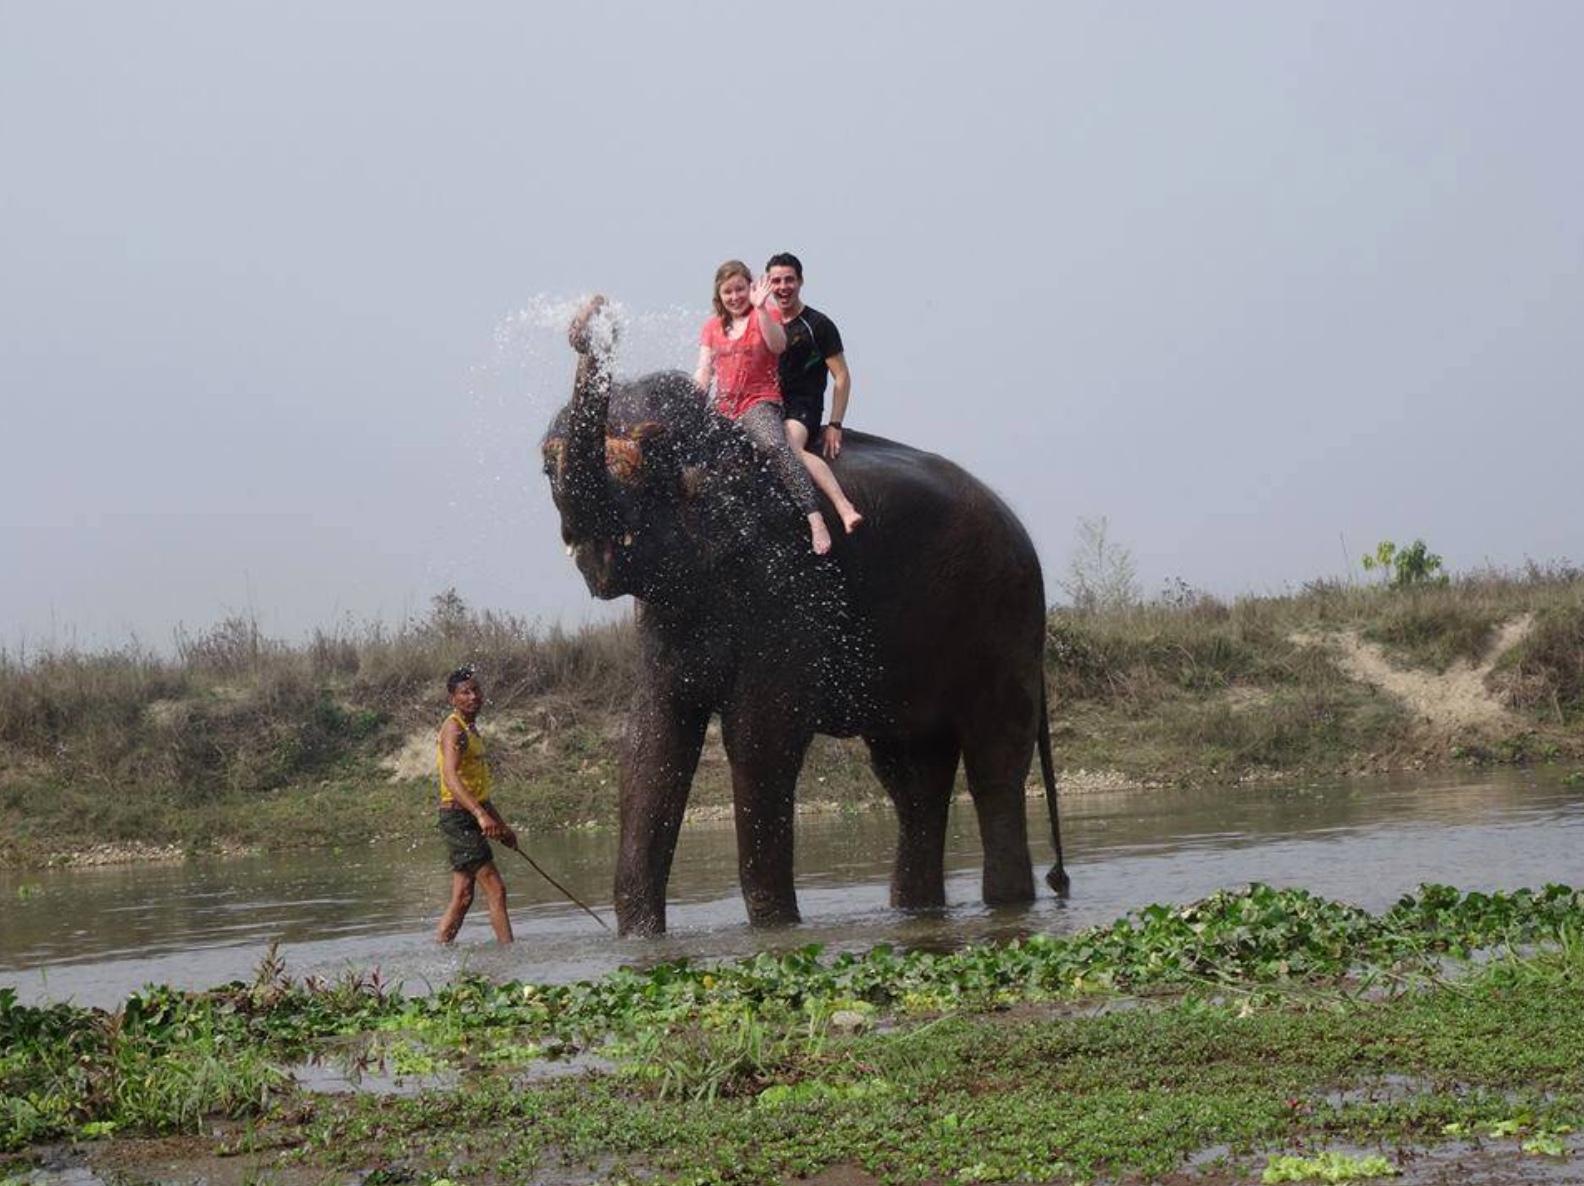 Riding on elephants in Nepal